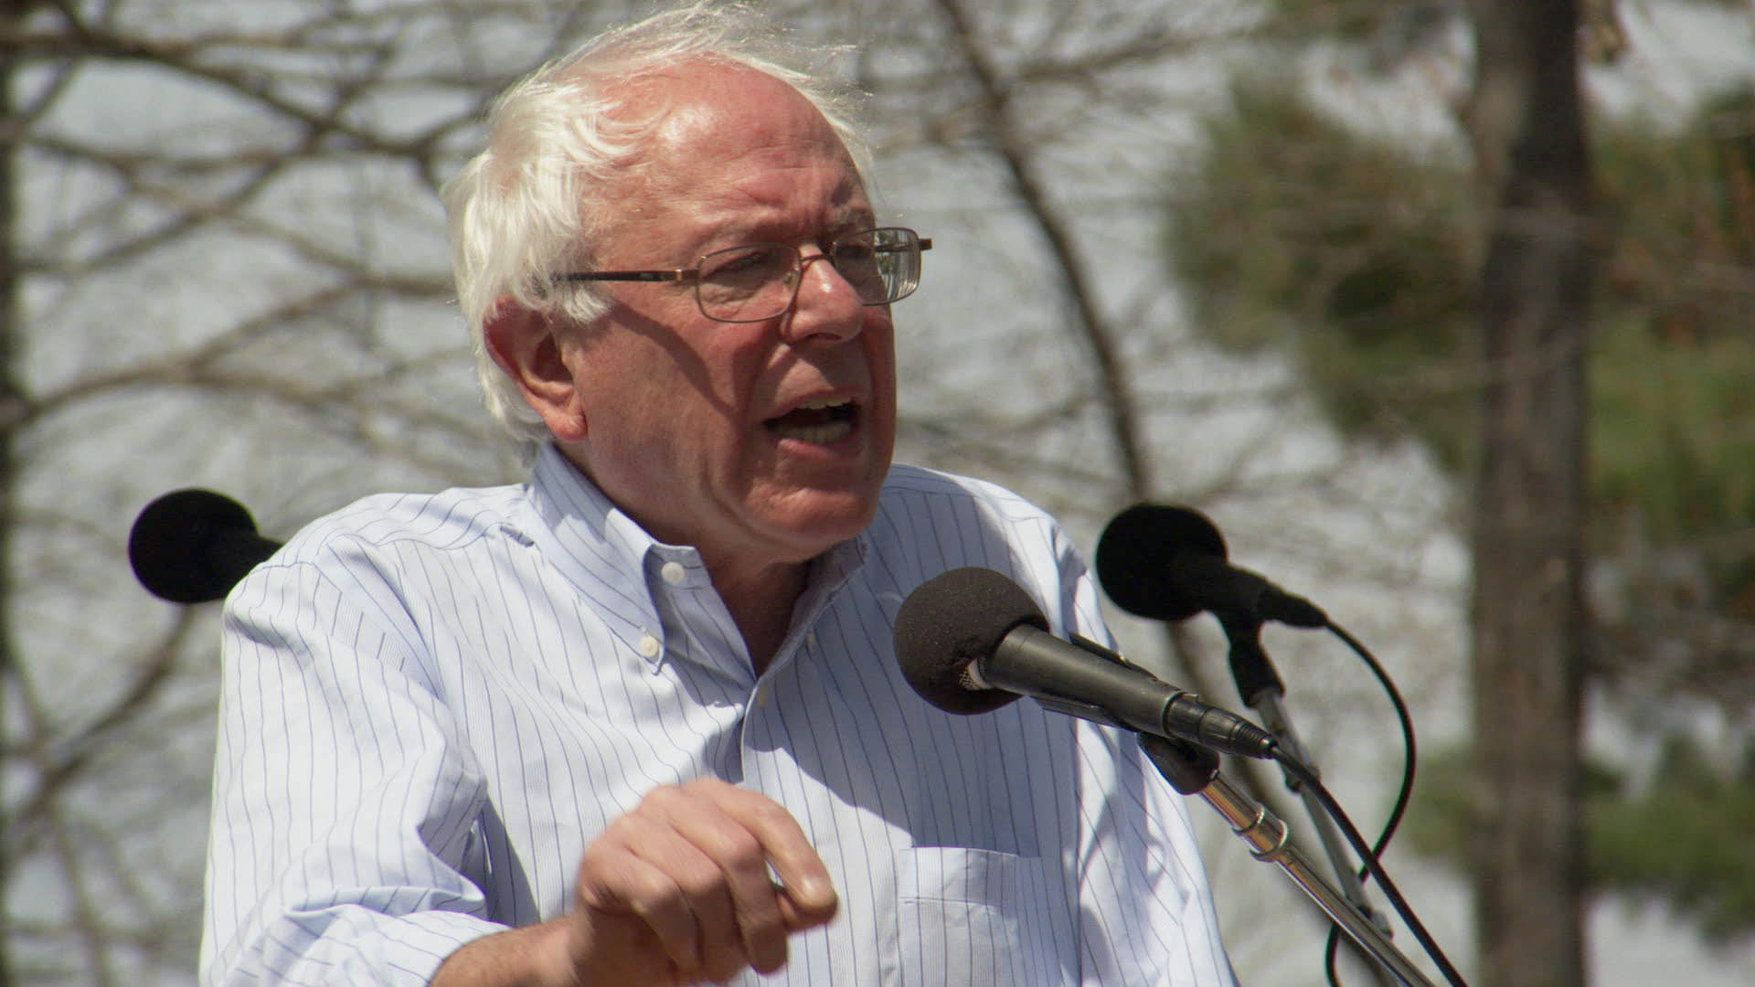 32-POWER STRUGGLE - Bernie Sanders 1.1.j